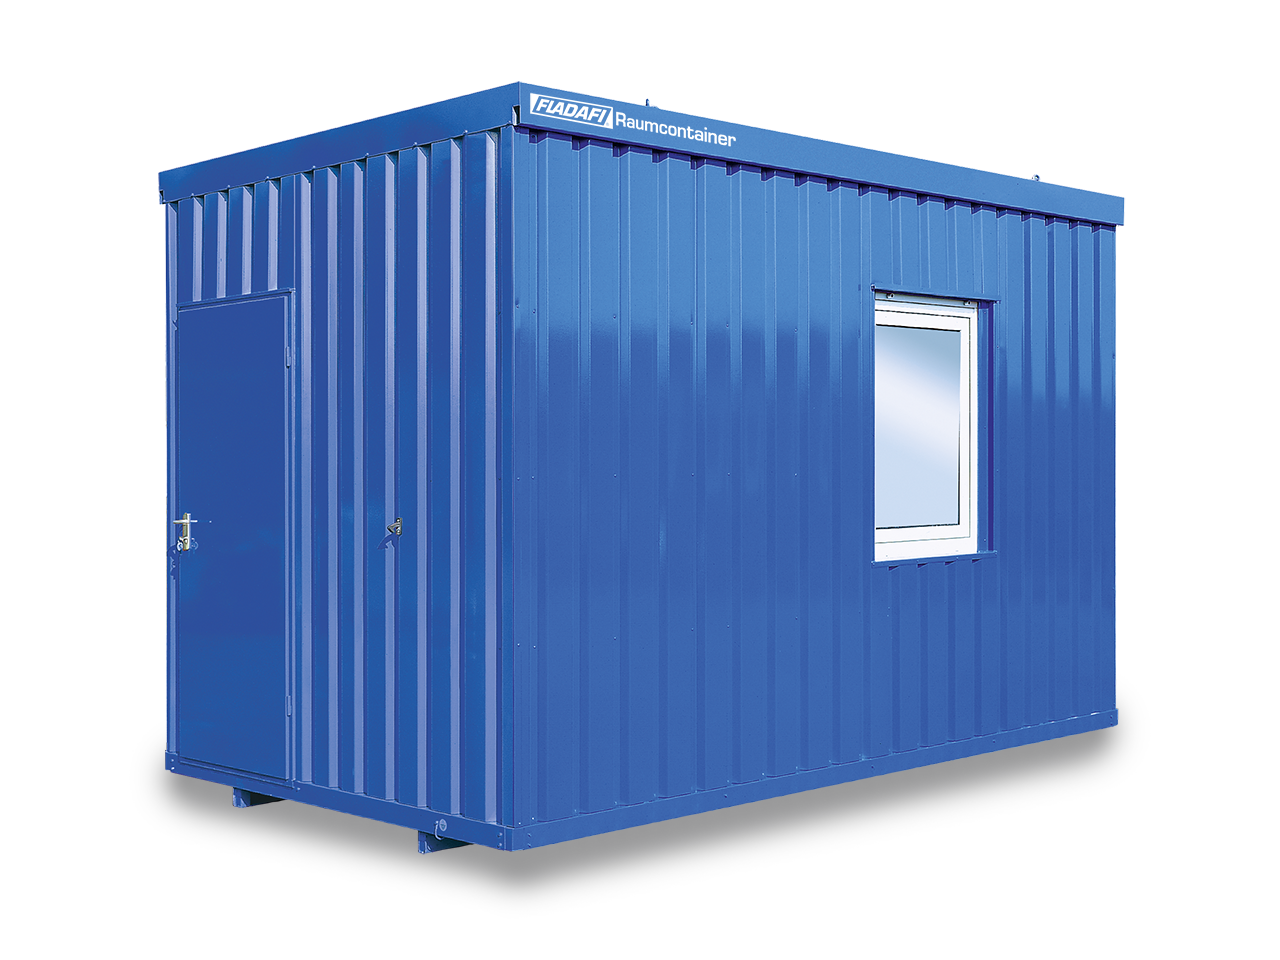 6851_FLADAFI-Raumcontainer-4M-6851_RC4M6851_RGB_0014_ft_sn_sl.png